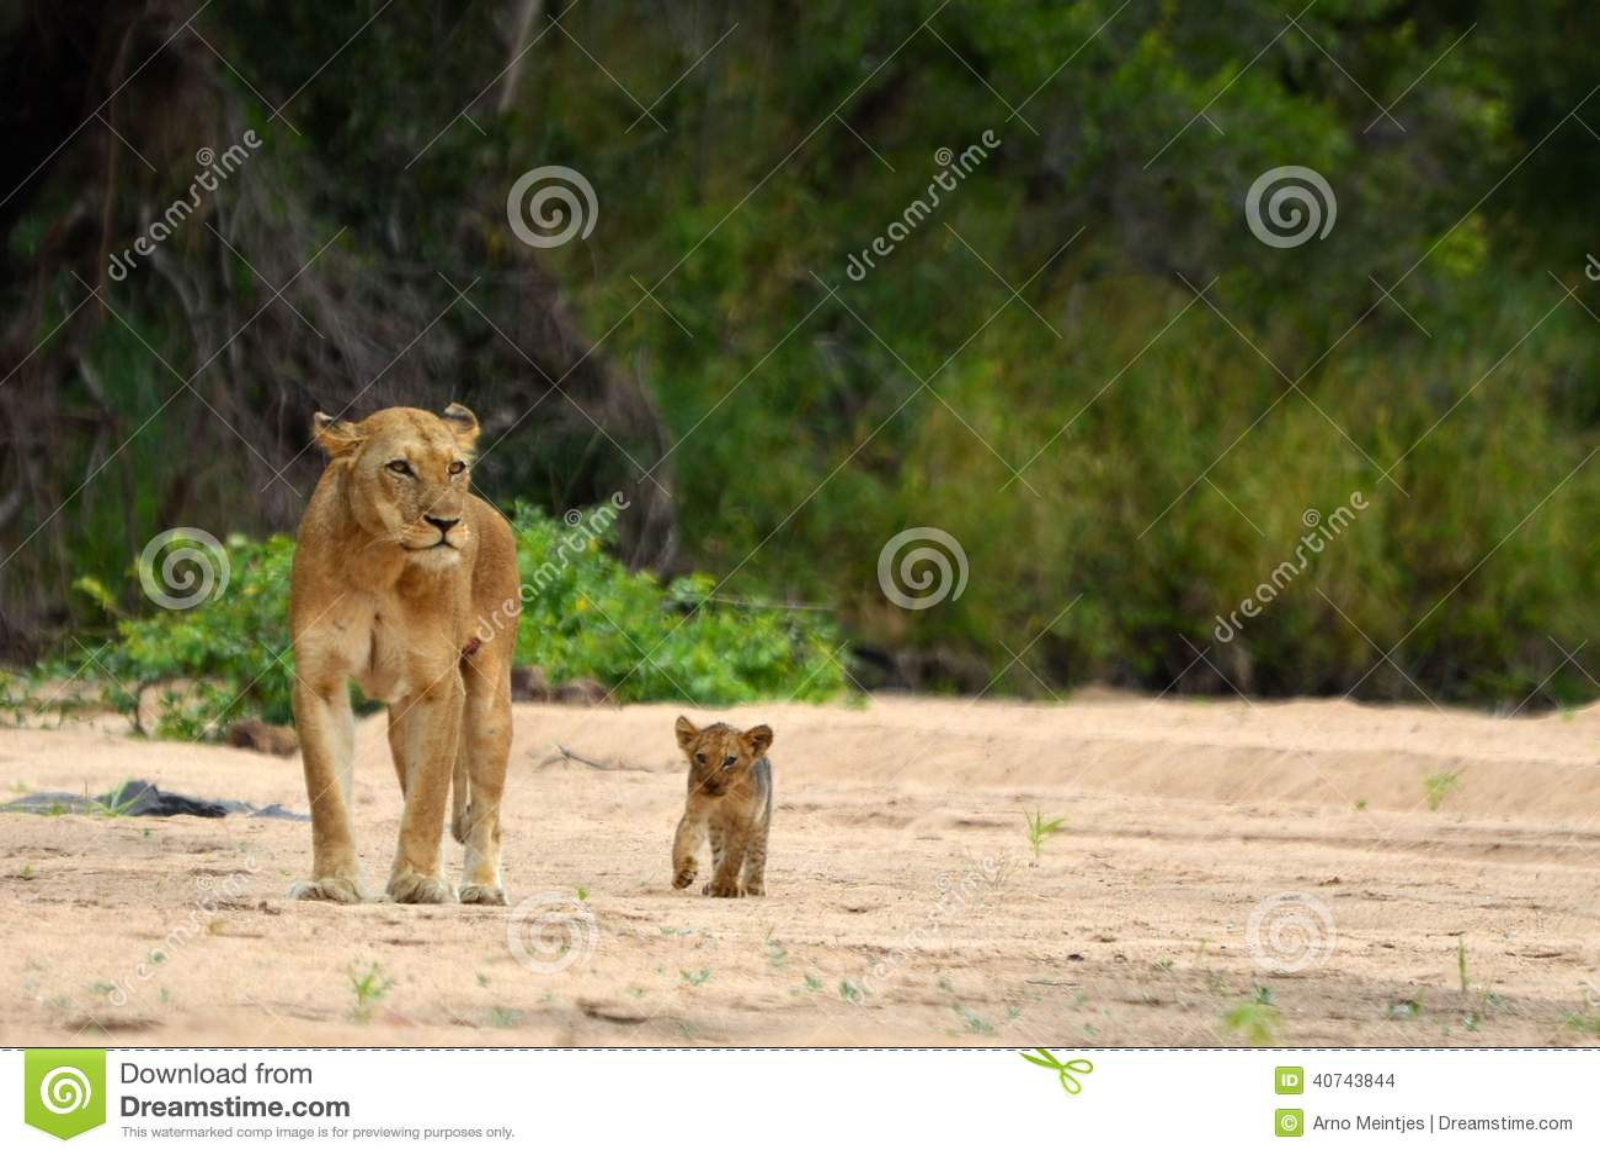 Lioness & Cub (Panthera leo)